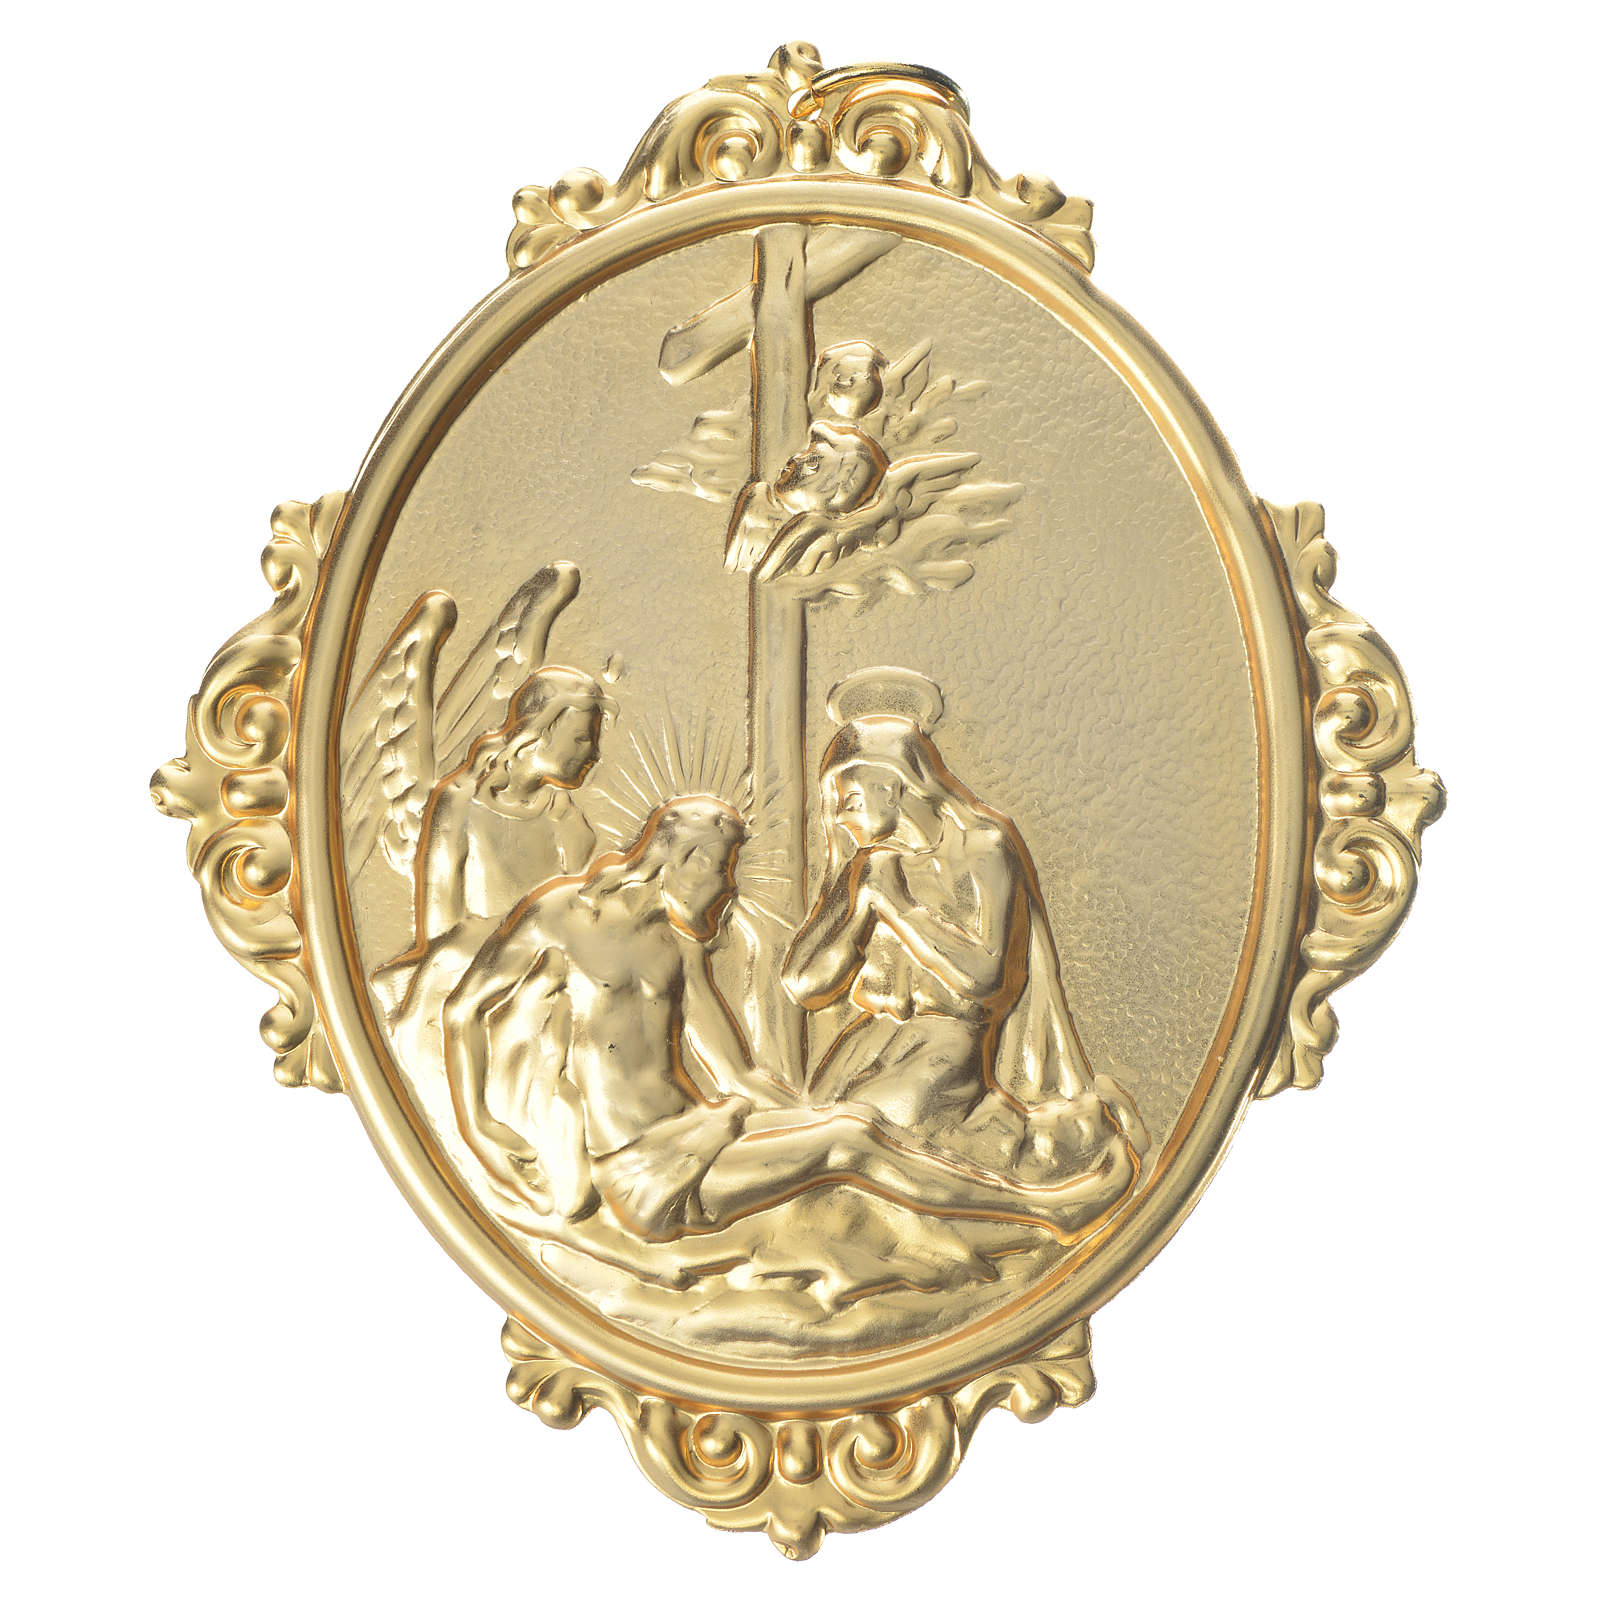 Confraternity Medal in brass, Deposition scene 3